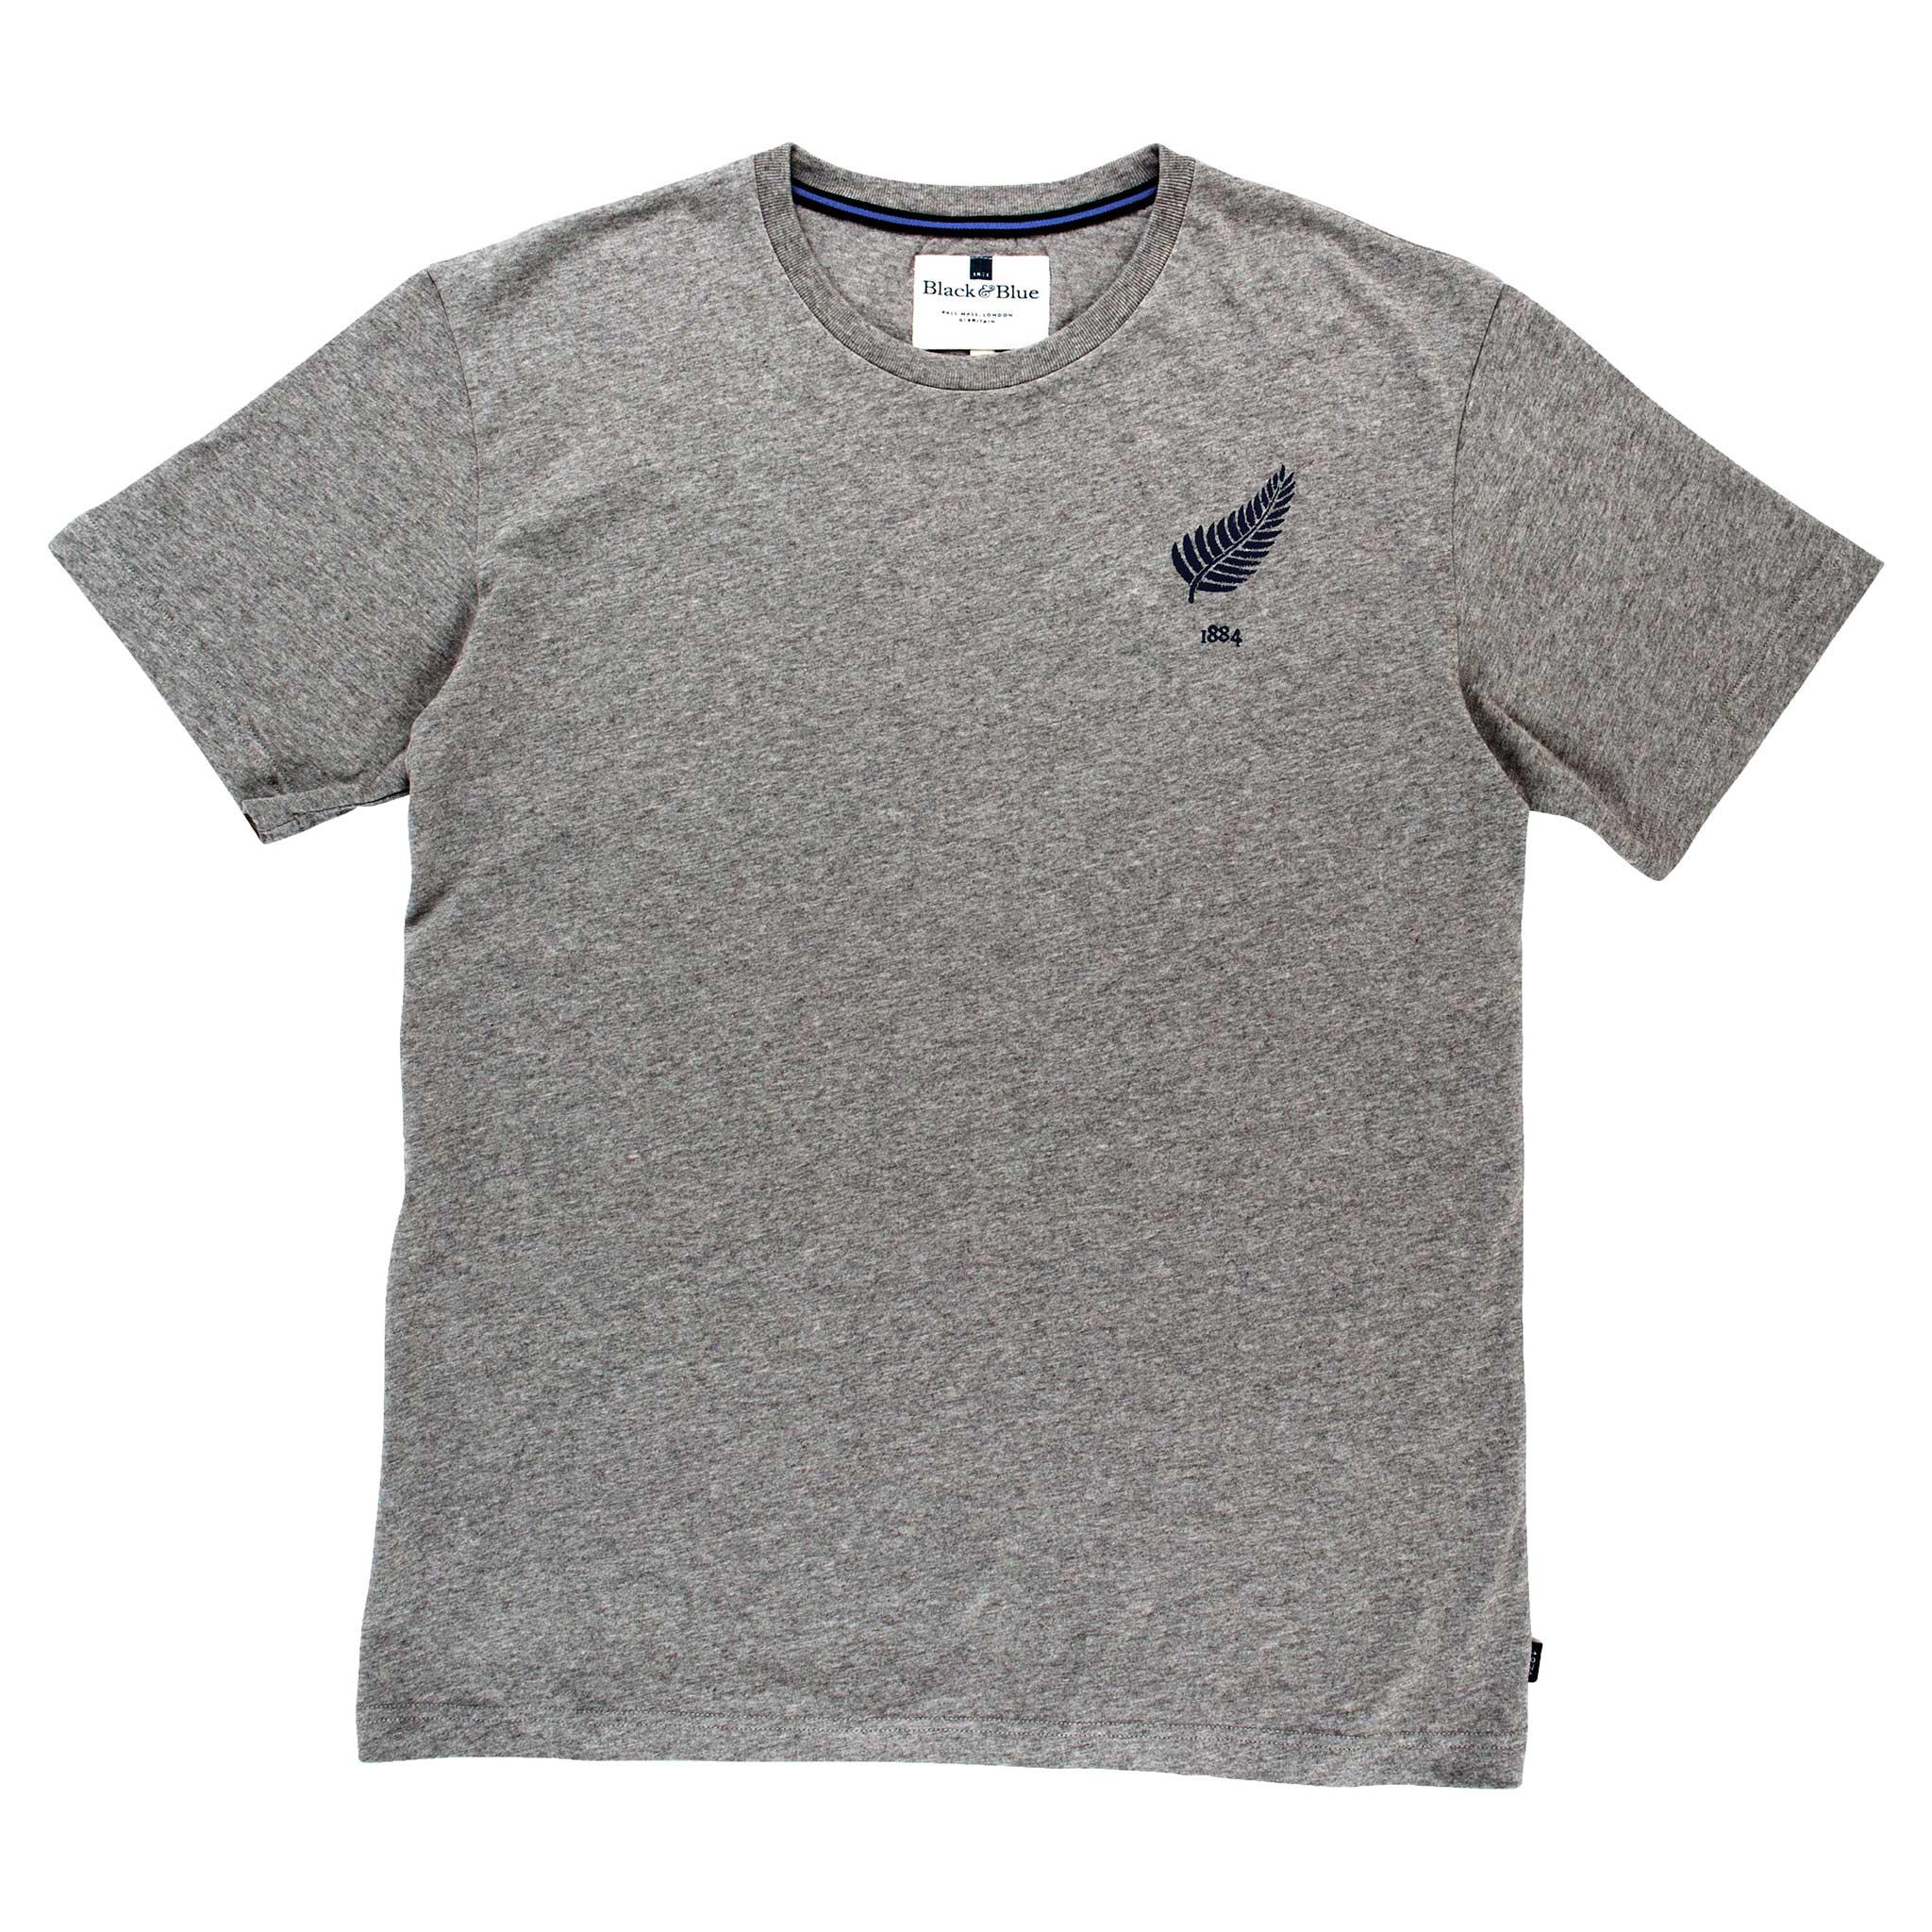 New Zealand 1884 Grey Tshirt_Front